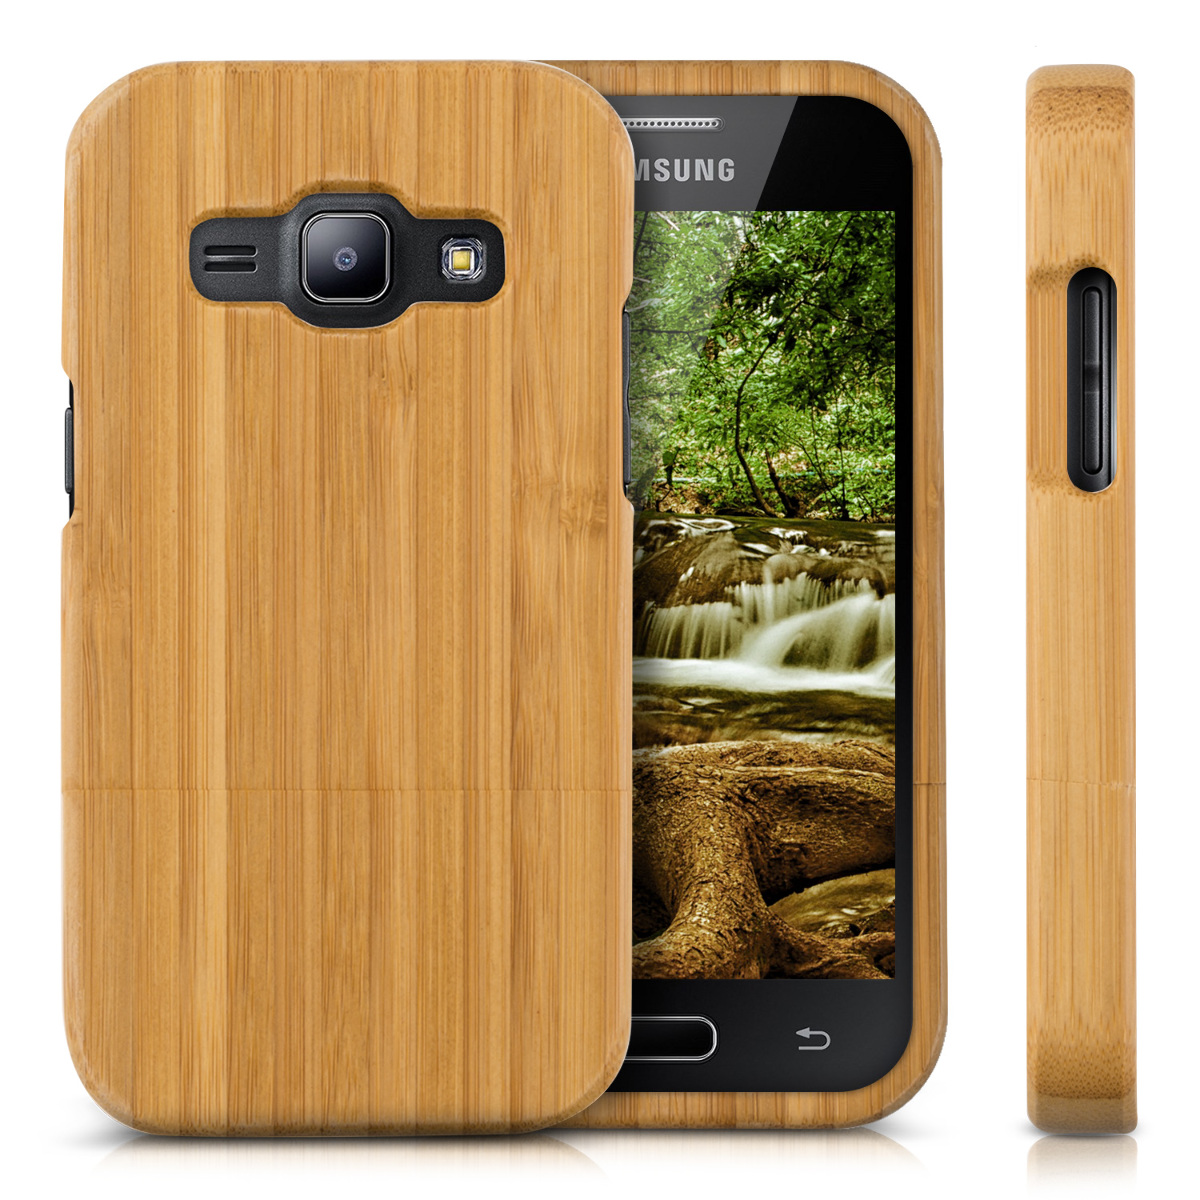 Bambus Mobel Produkte Nachhaltigkeit